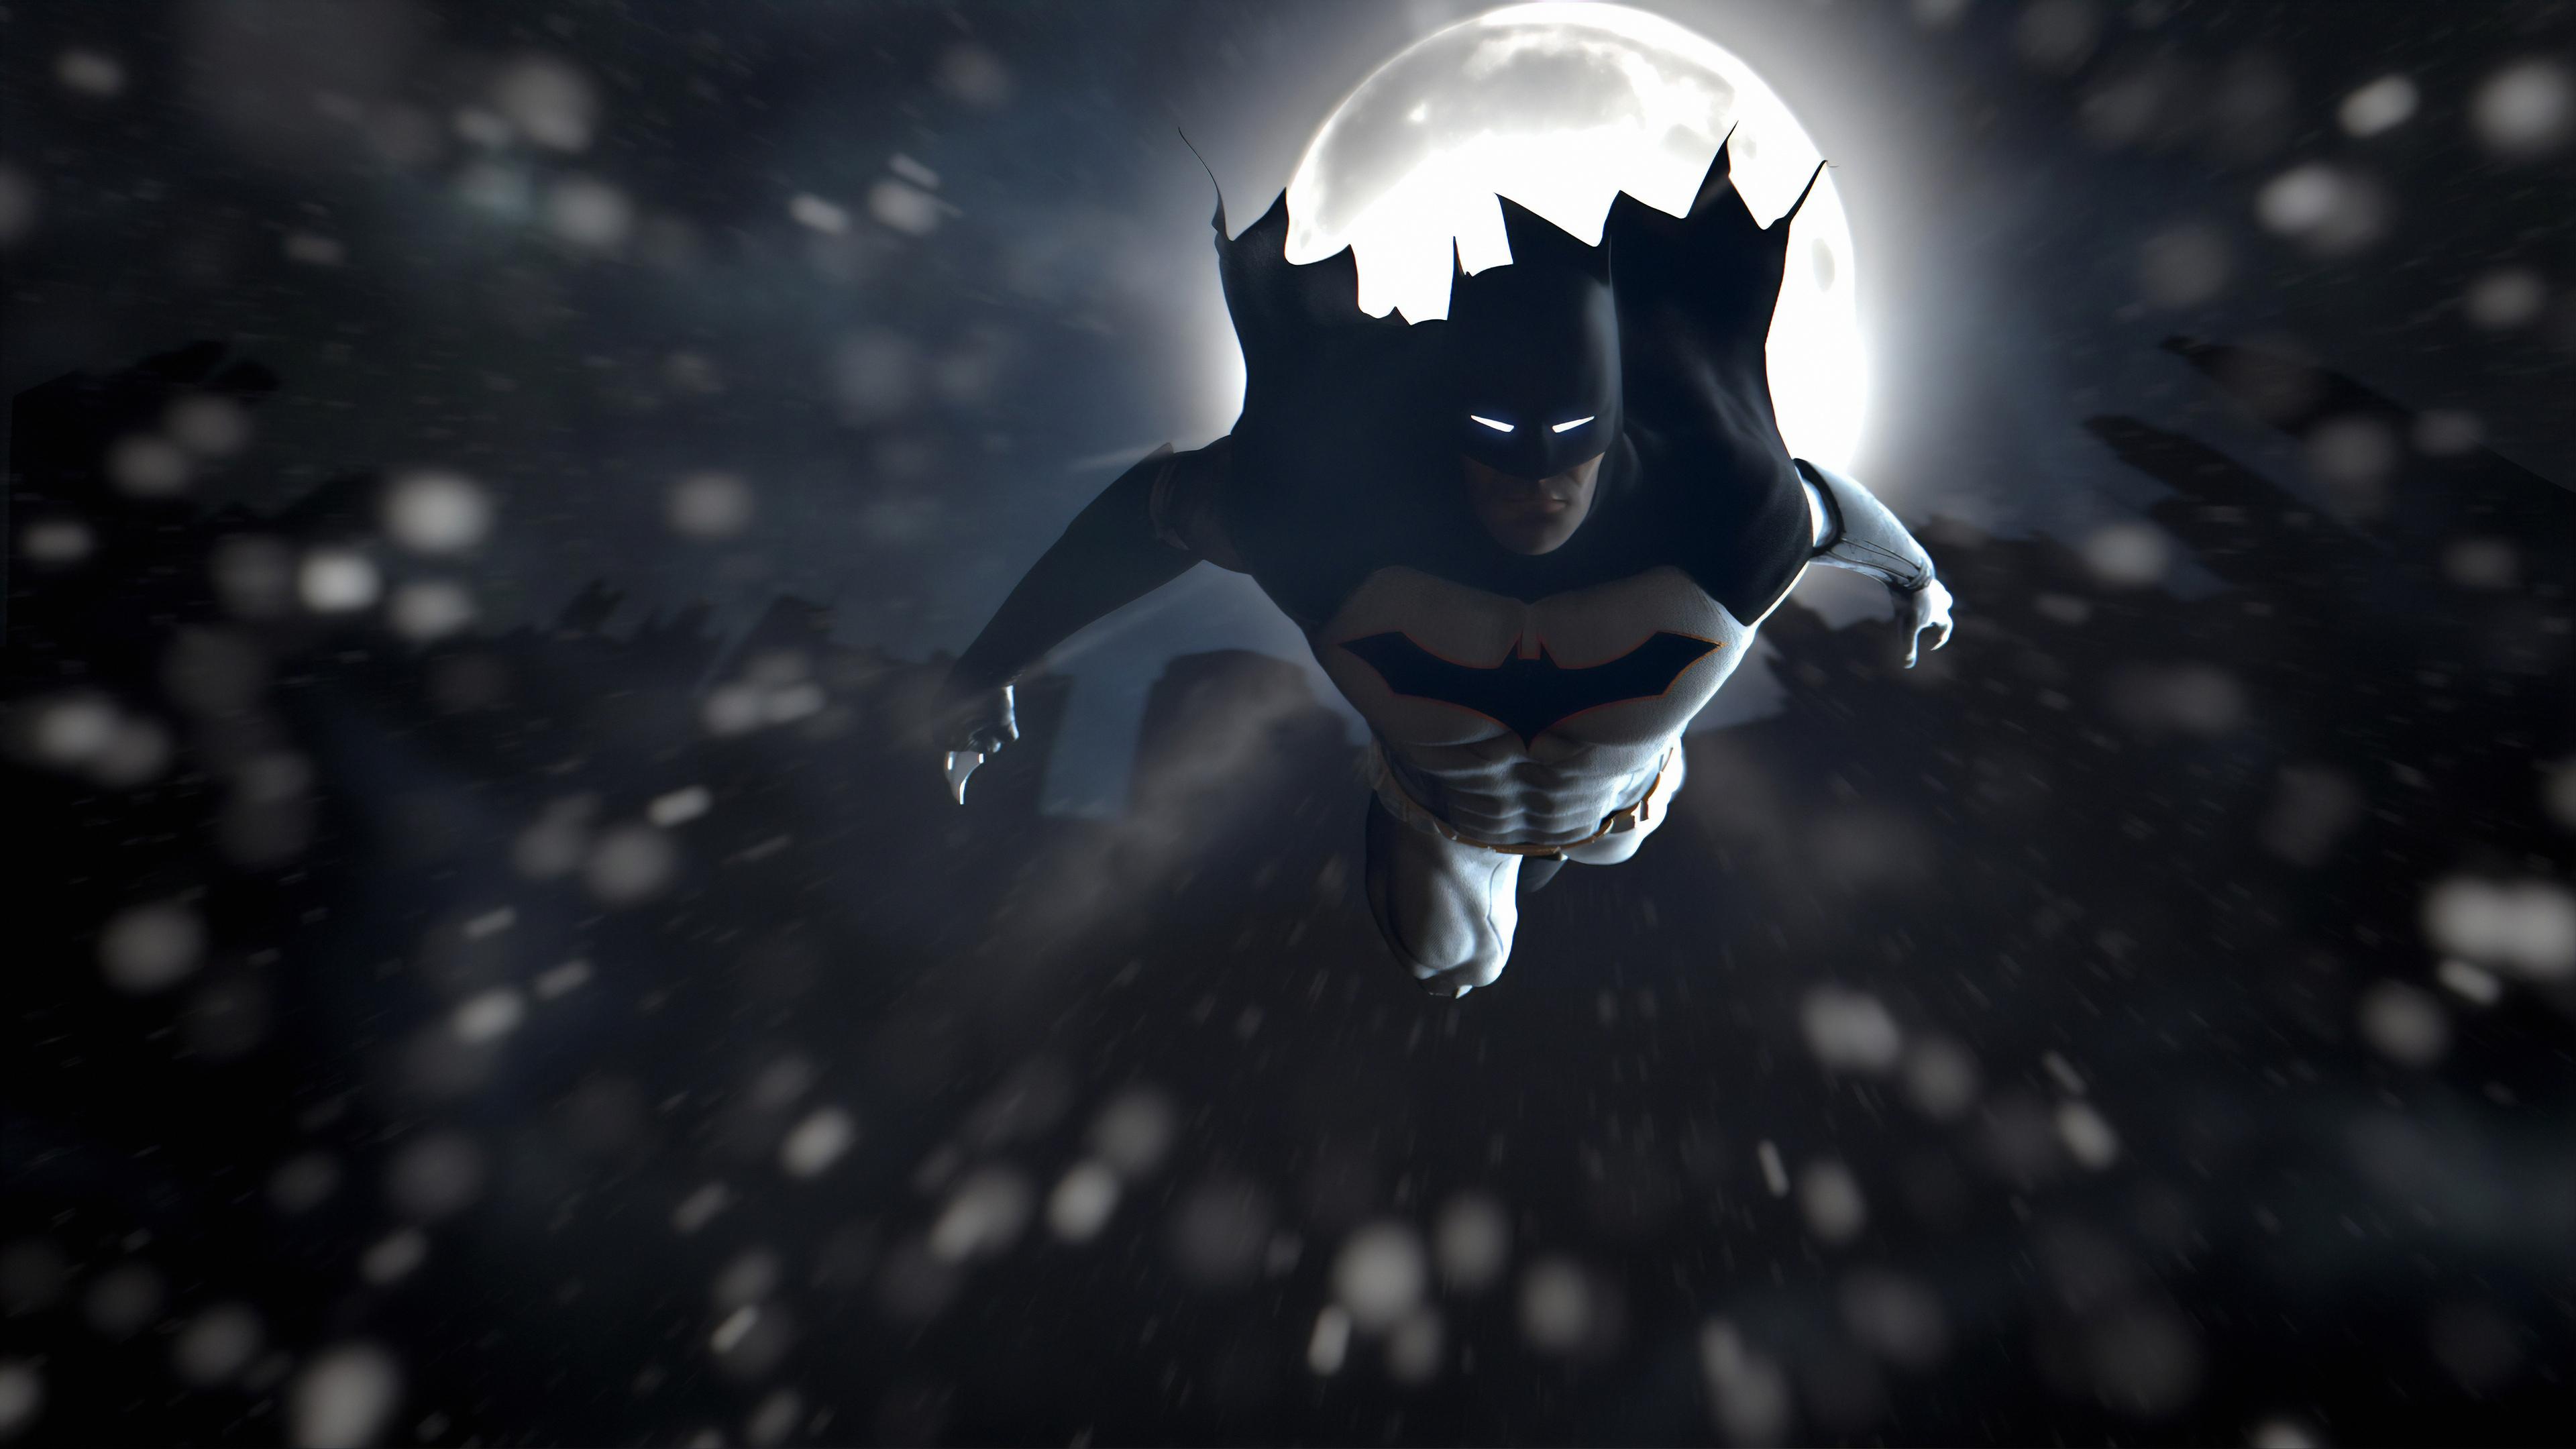 batman moon knight 1570394273 - Batman Moon Knight - superheroes wallpapers, hd-wallpapers, digital art wallpapers, batman wallpapers, artwork wallpapers, artstation wallpapers, 4k-wallpapers